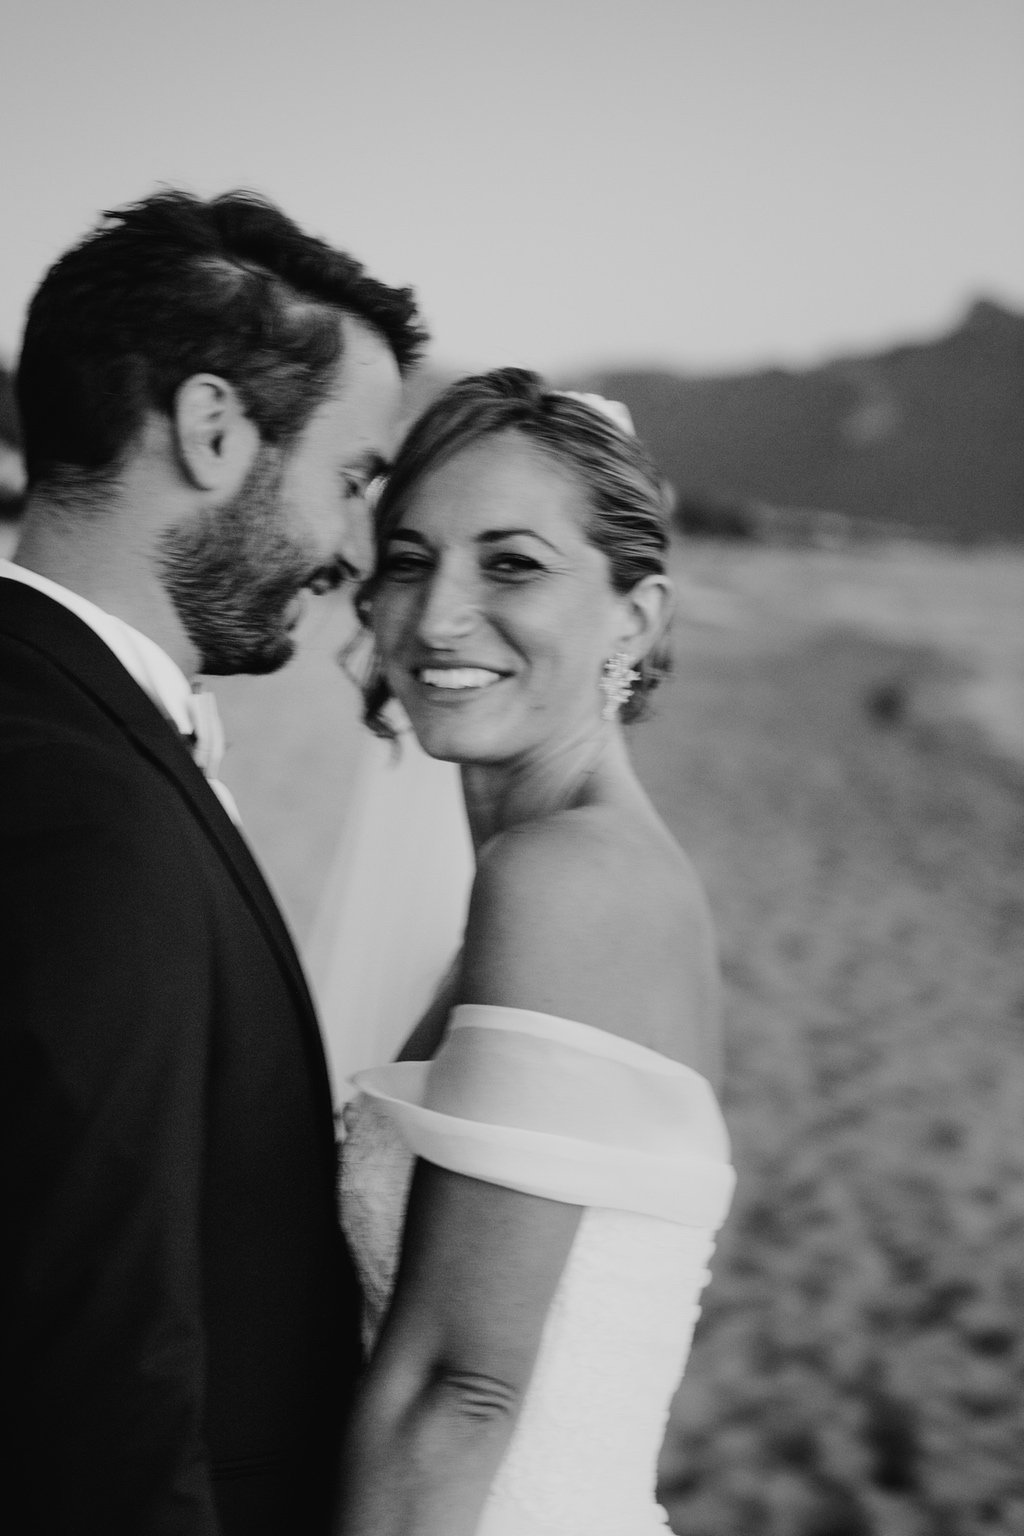 emotional-wedding-photographer-bride-groom-portrait